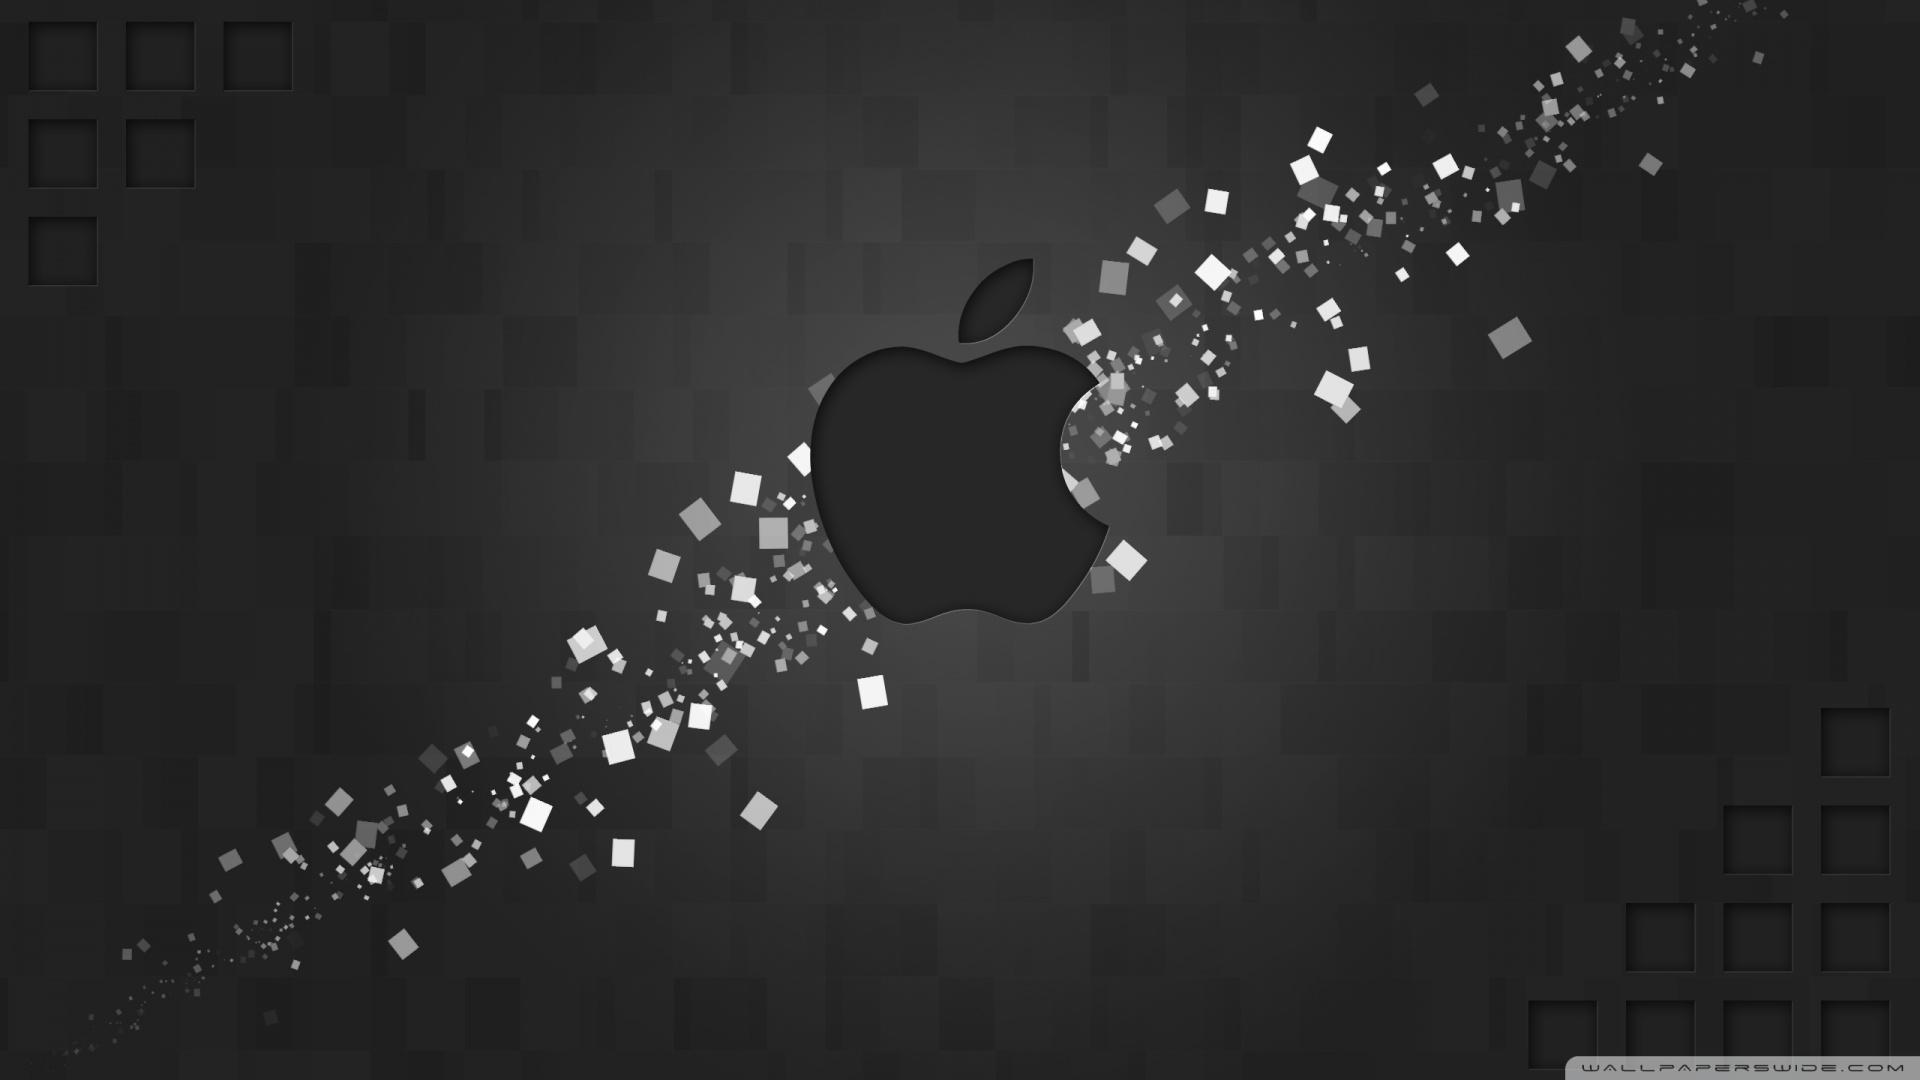 Hi tech apple logo wallpaper 1920×1080